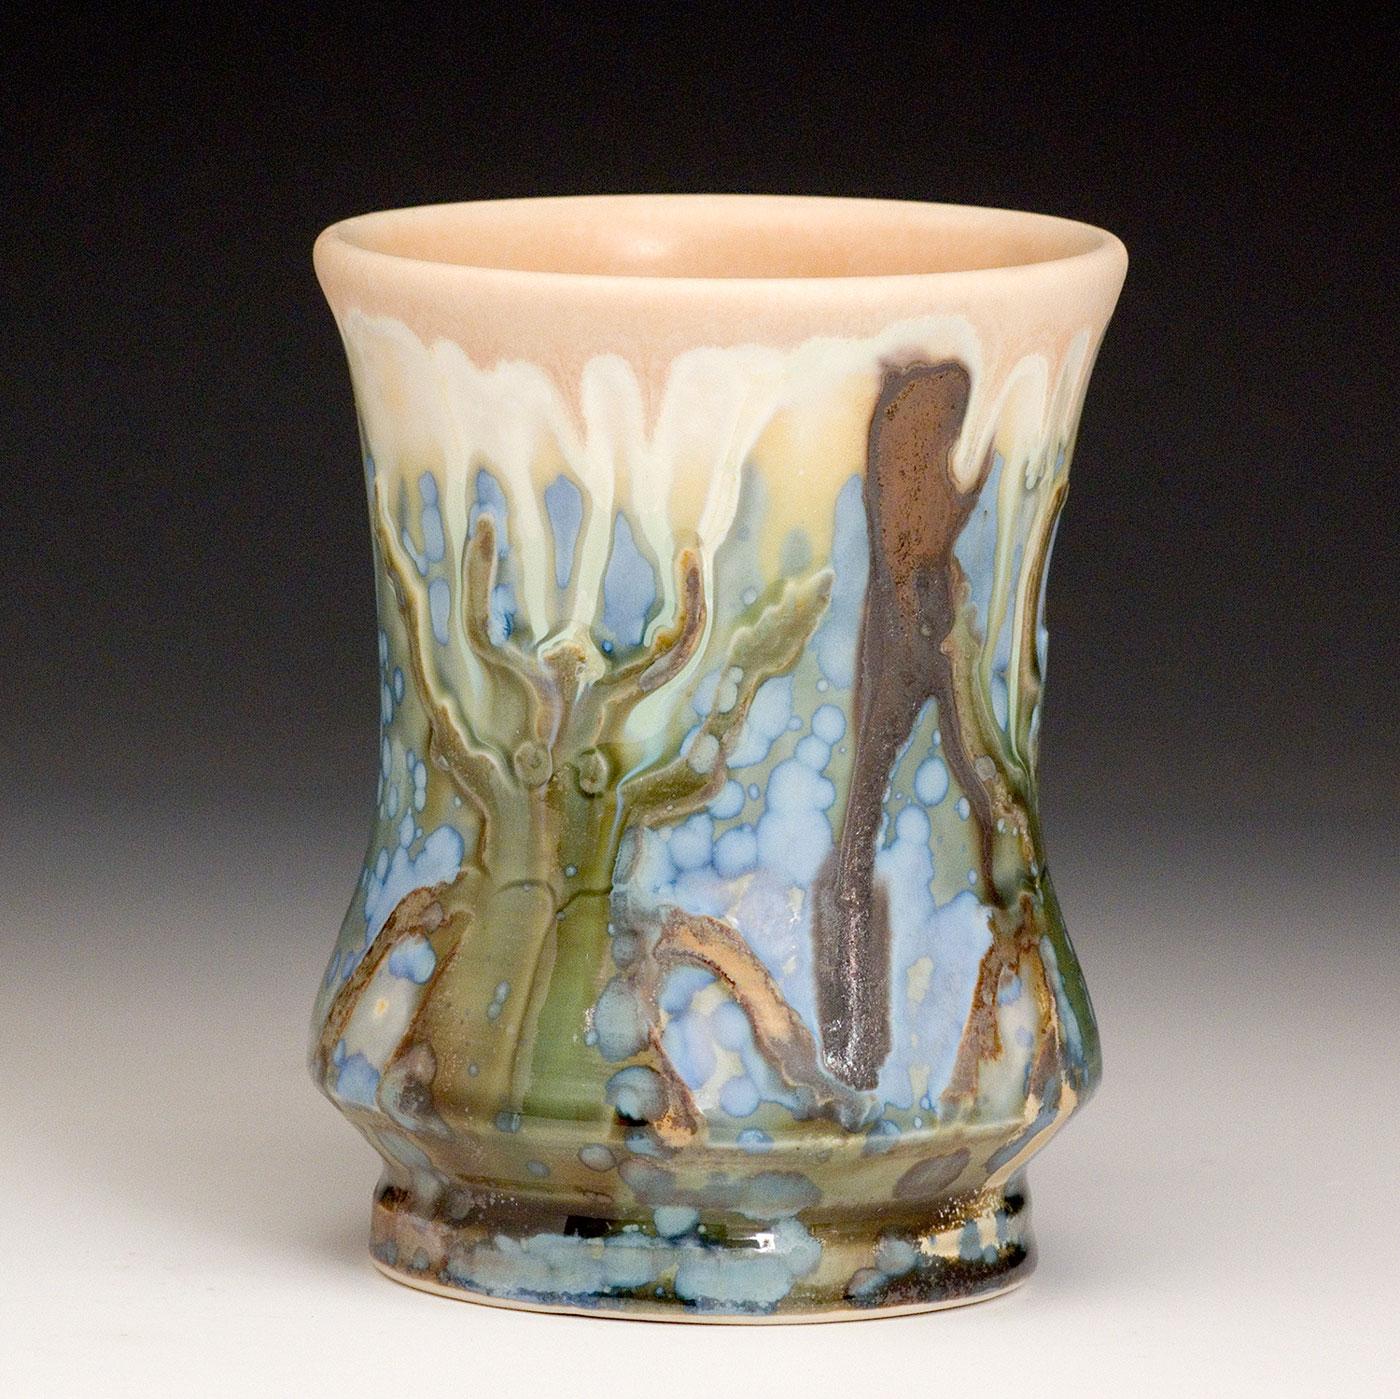 Blue-Weevil-Ceramic-Art-Cup-Samantha-Henneke.jpg